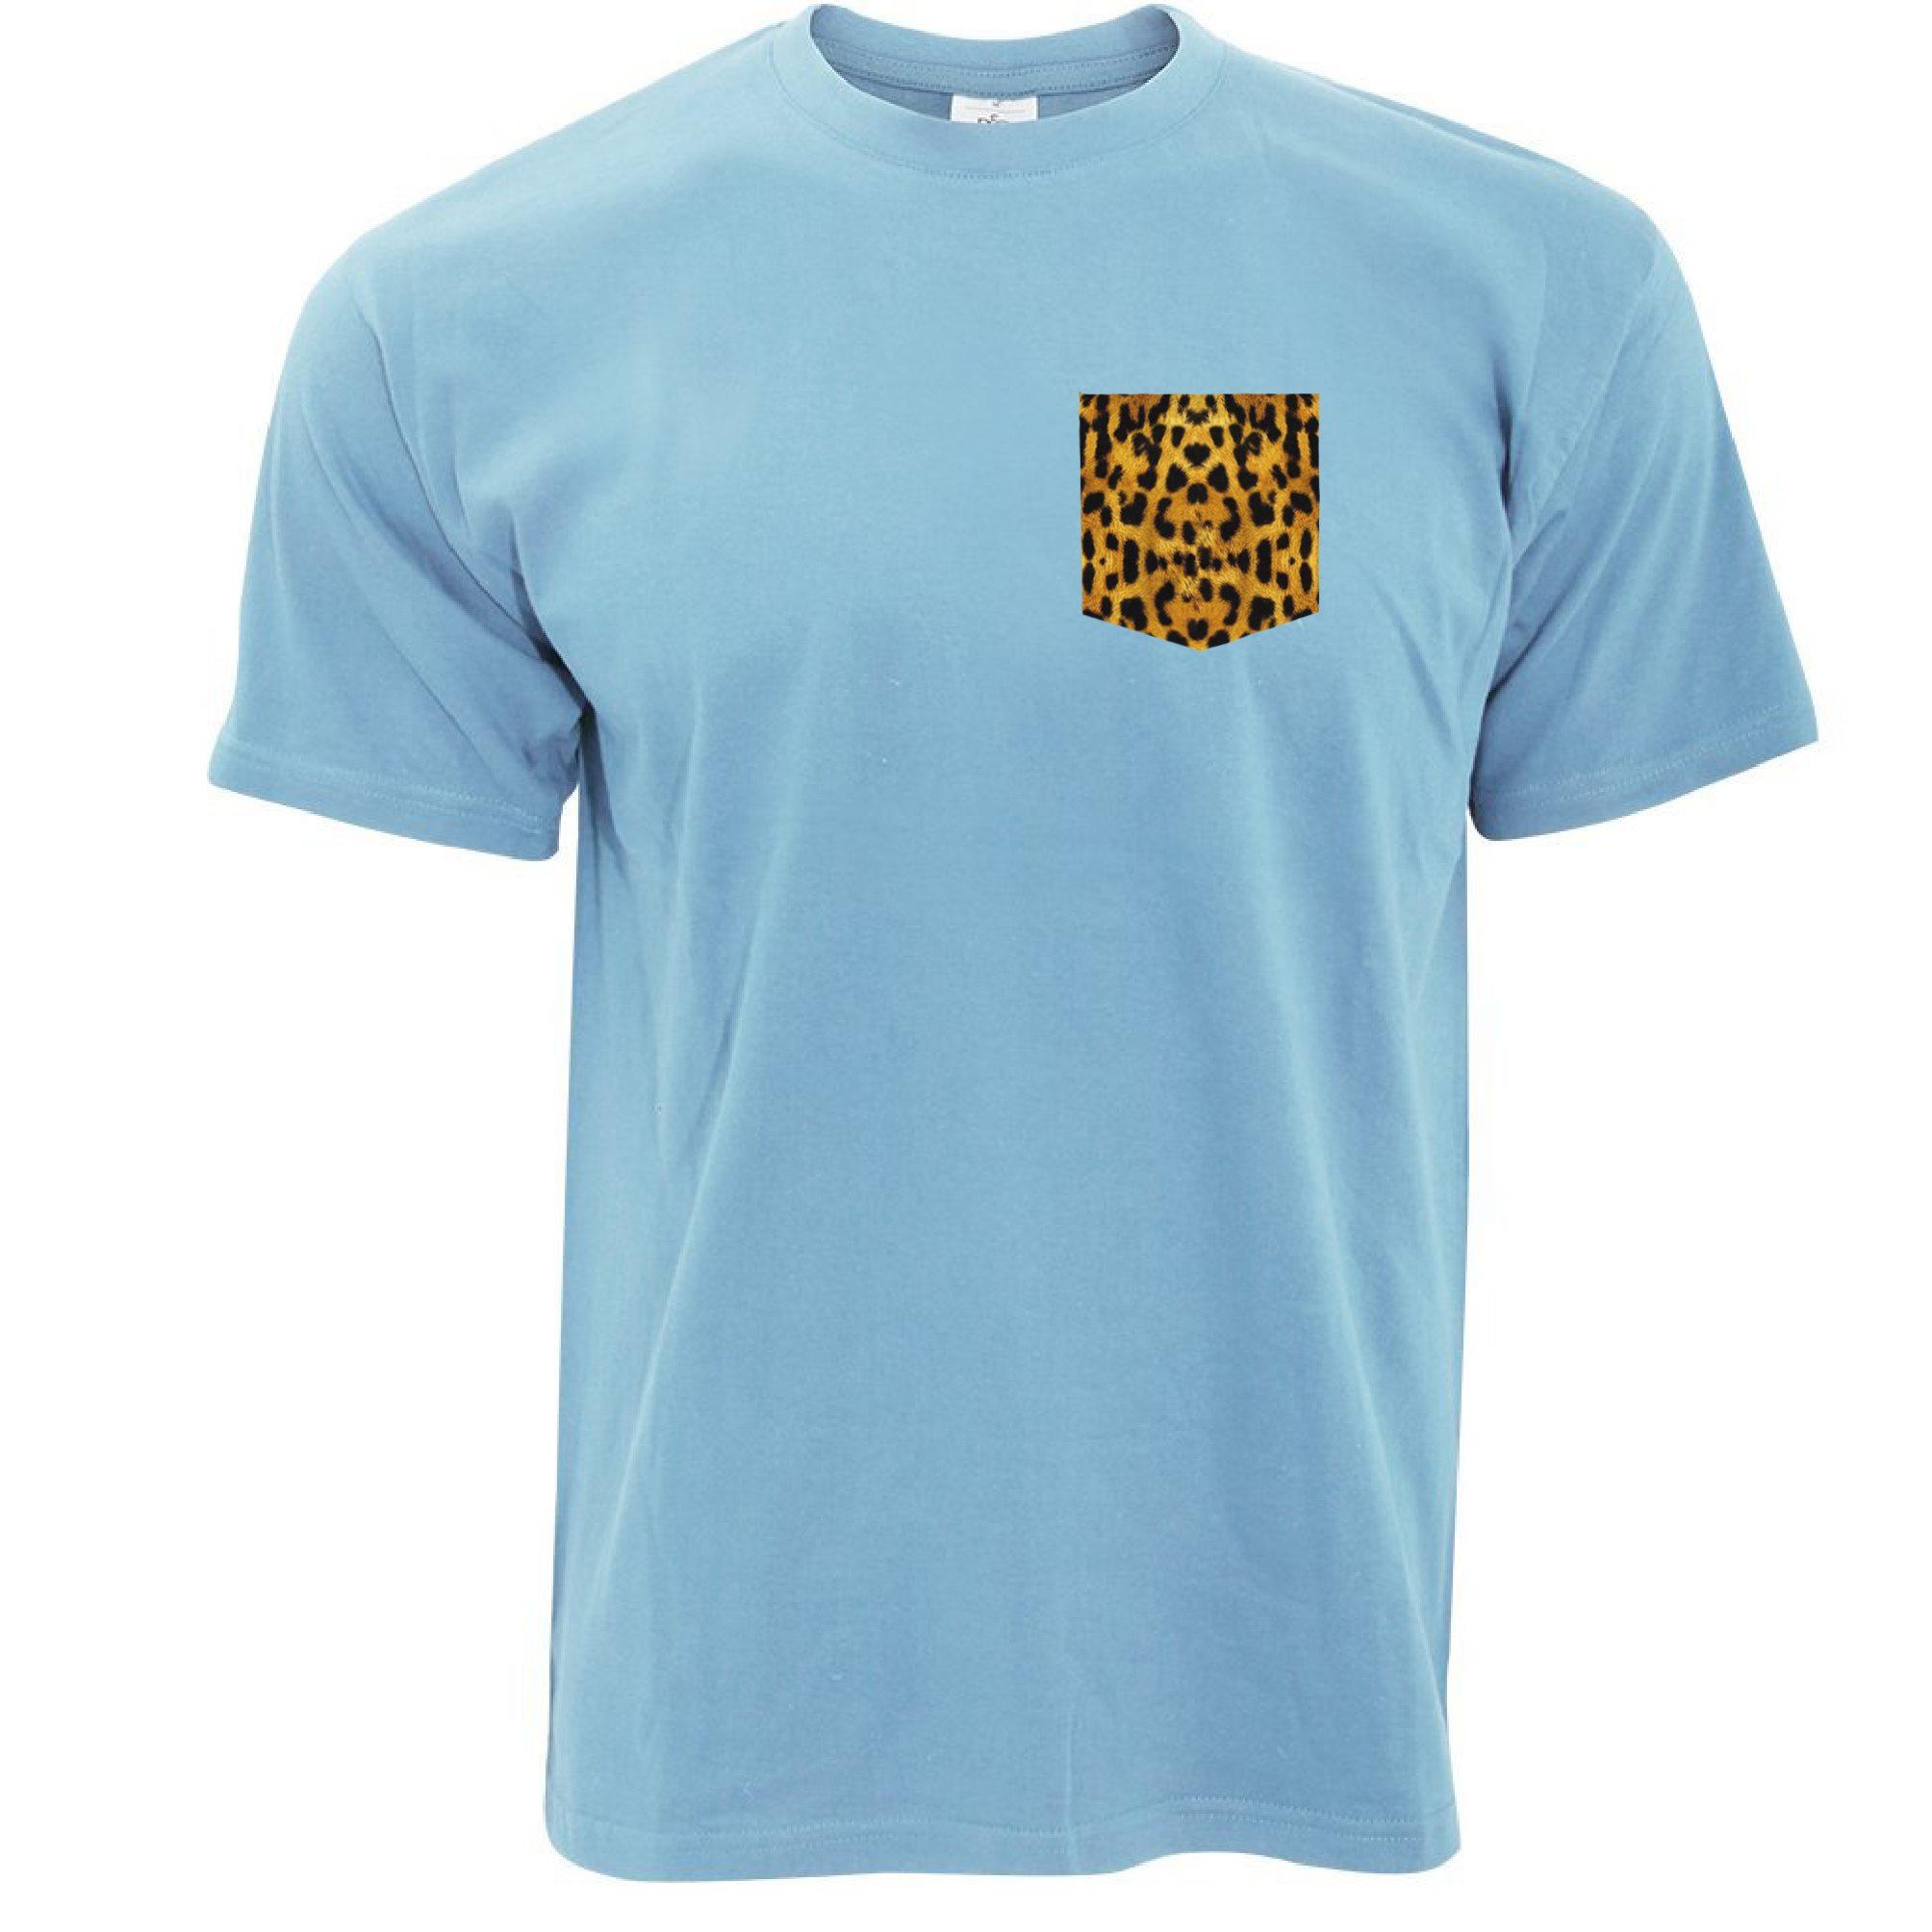 Mens Cool Hipster T Shirt Leopard Print Fake Pocket Printed Swag Fun Tshirt